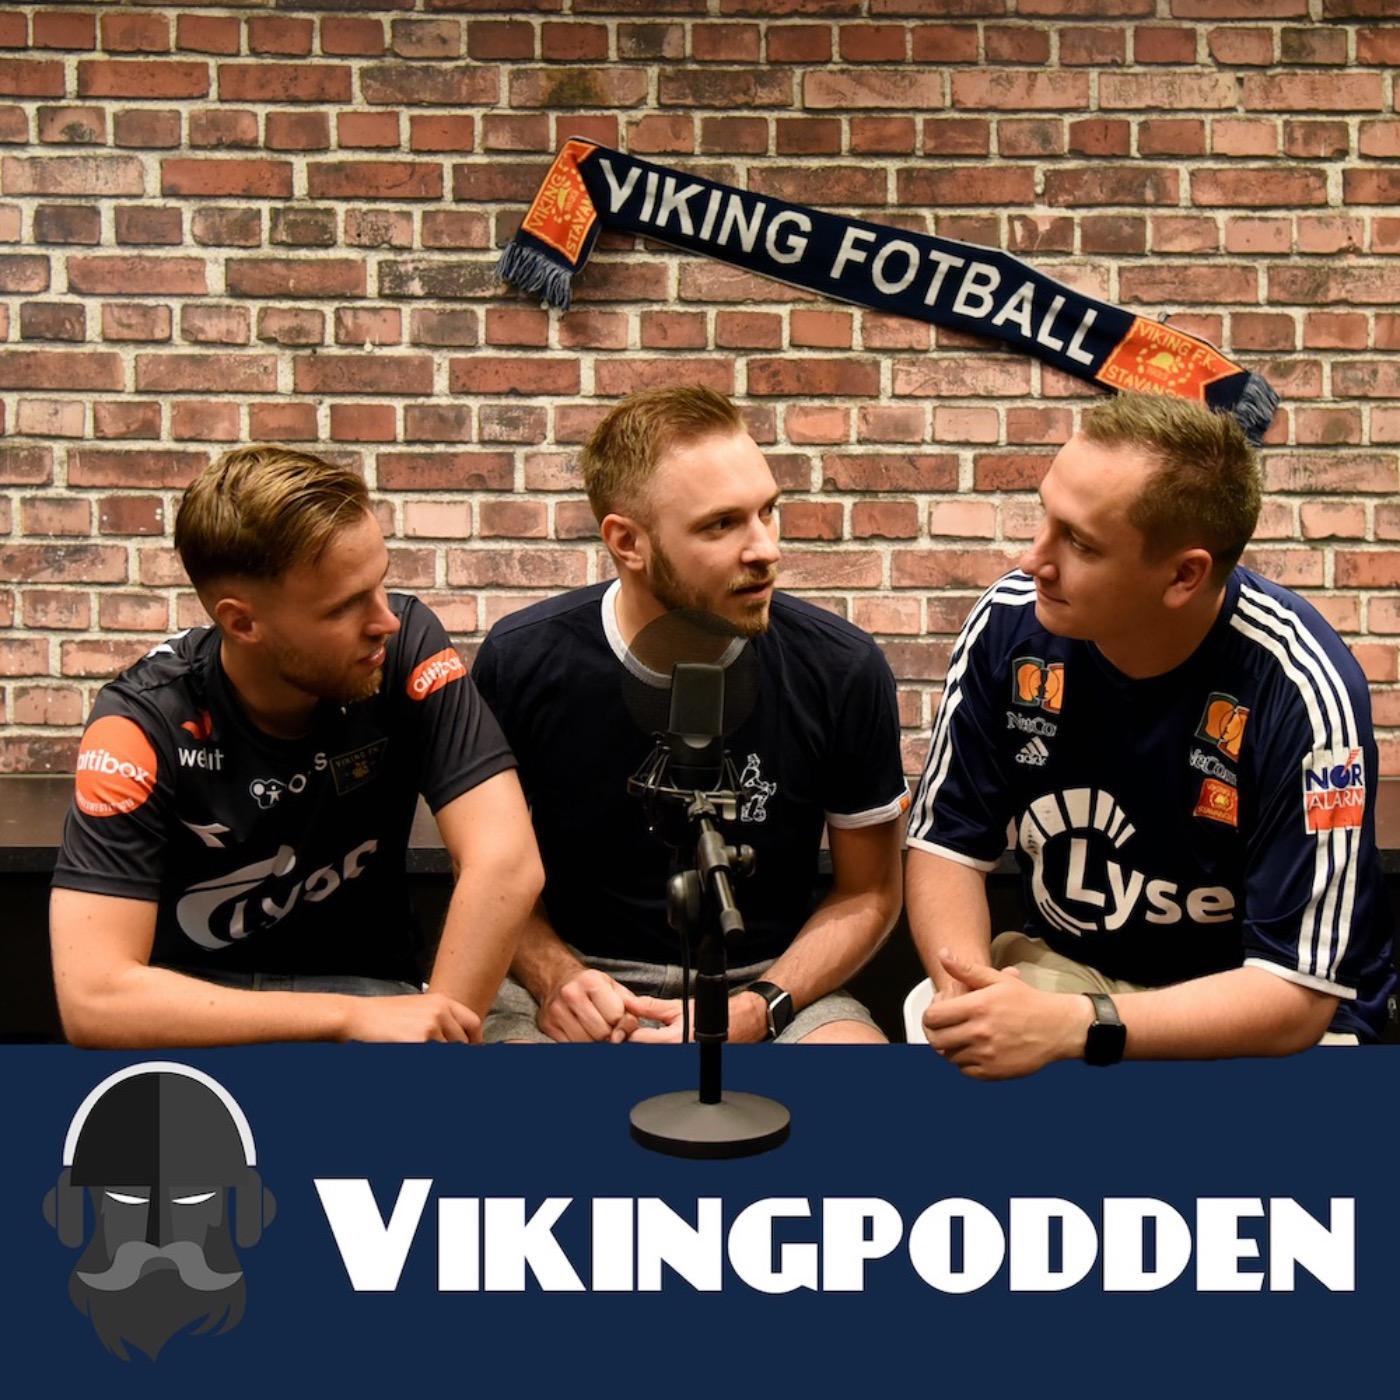 Vikingpodden